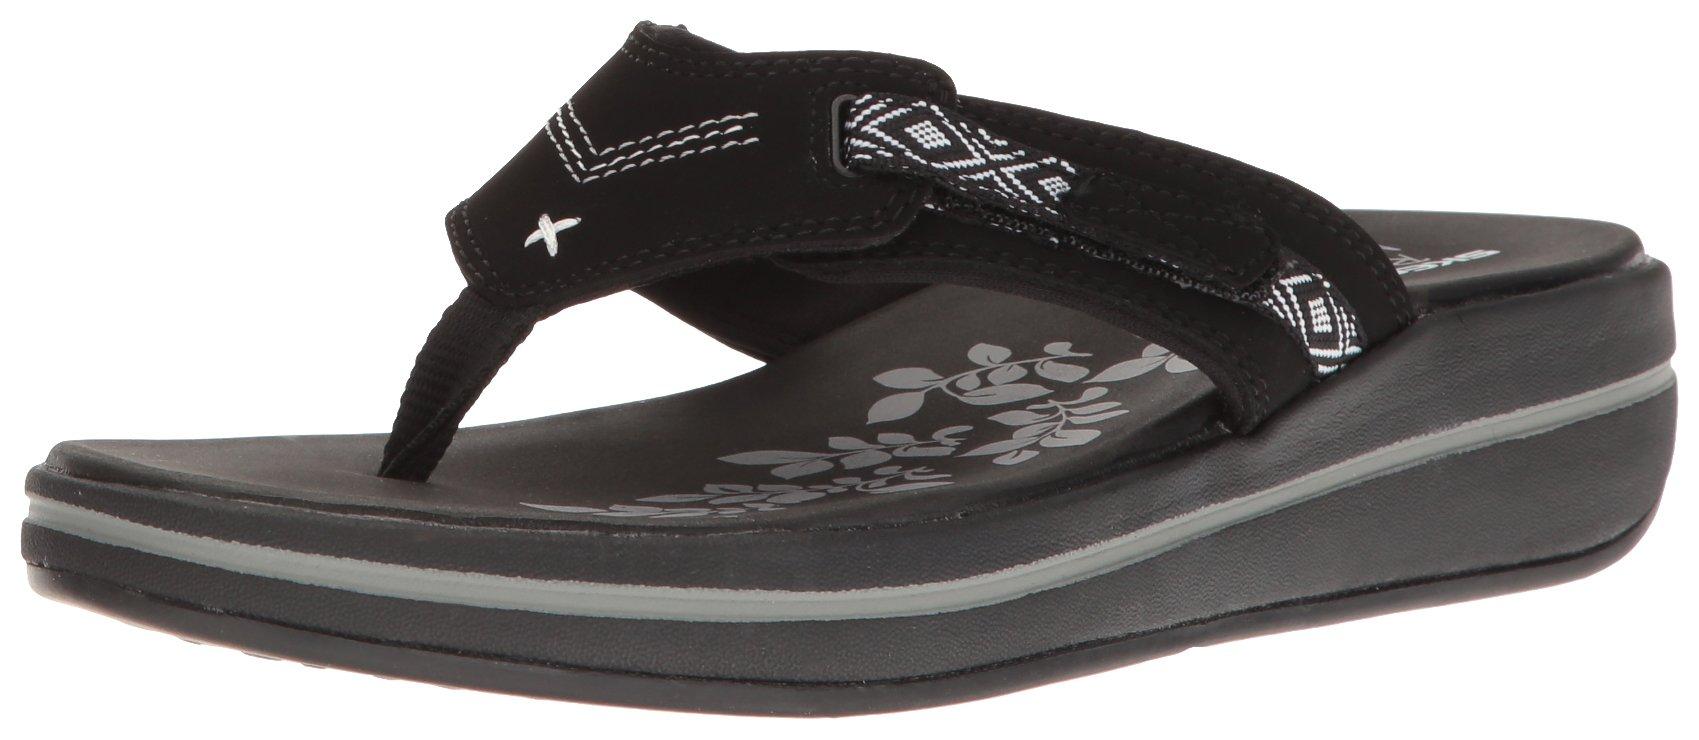 Skechers Modern Comfort Sandals Women's Upgrades Marina Bay Flip Flop Black/White, 8 M US